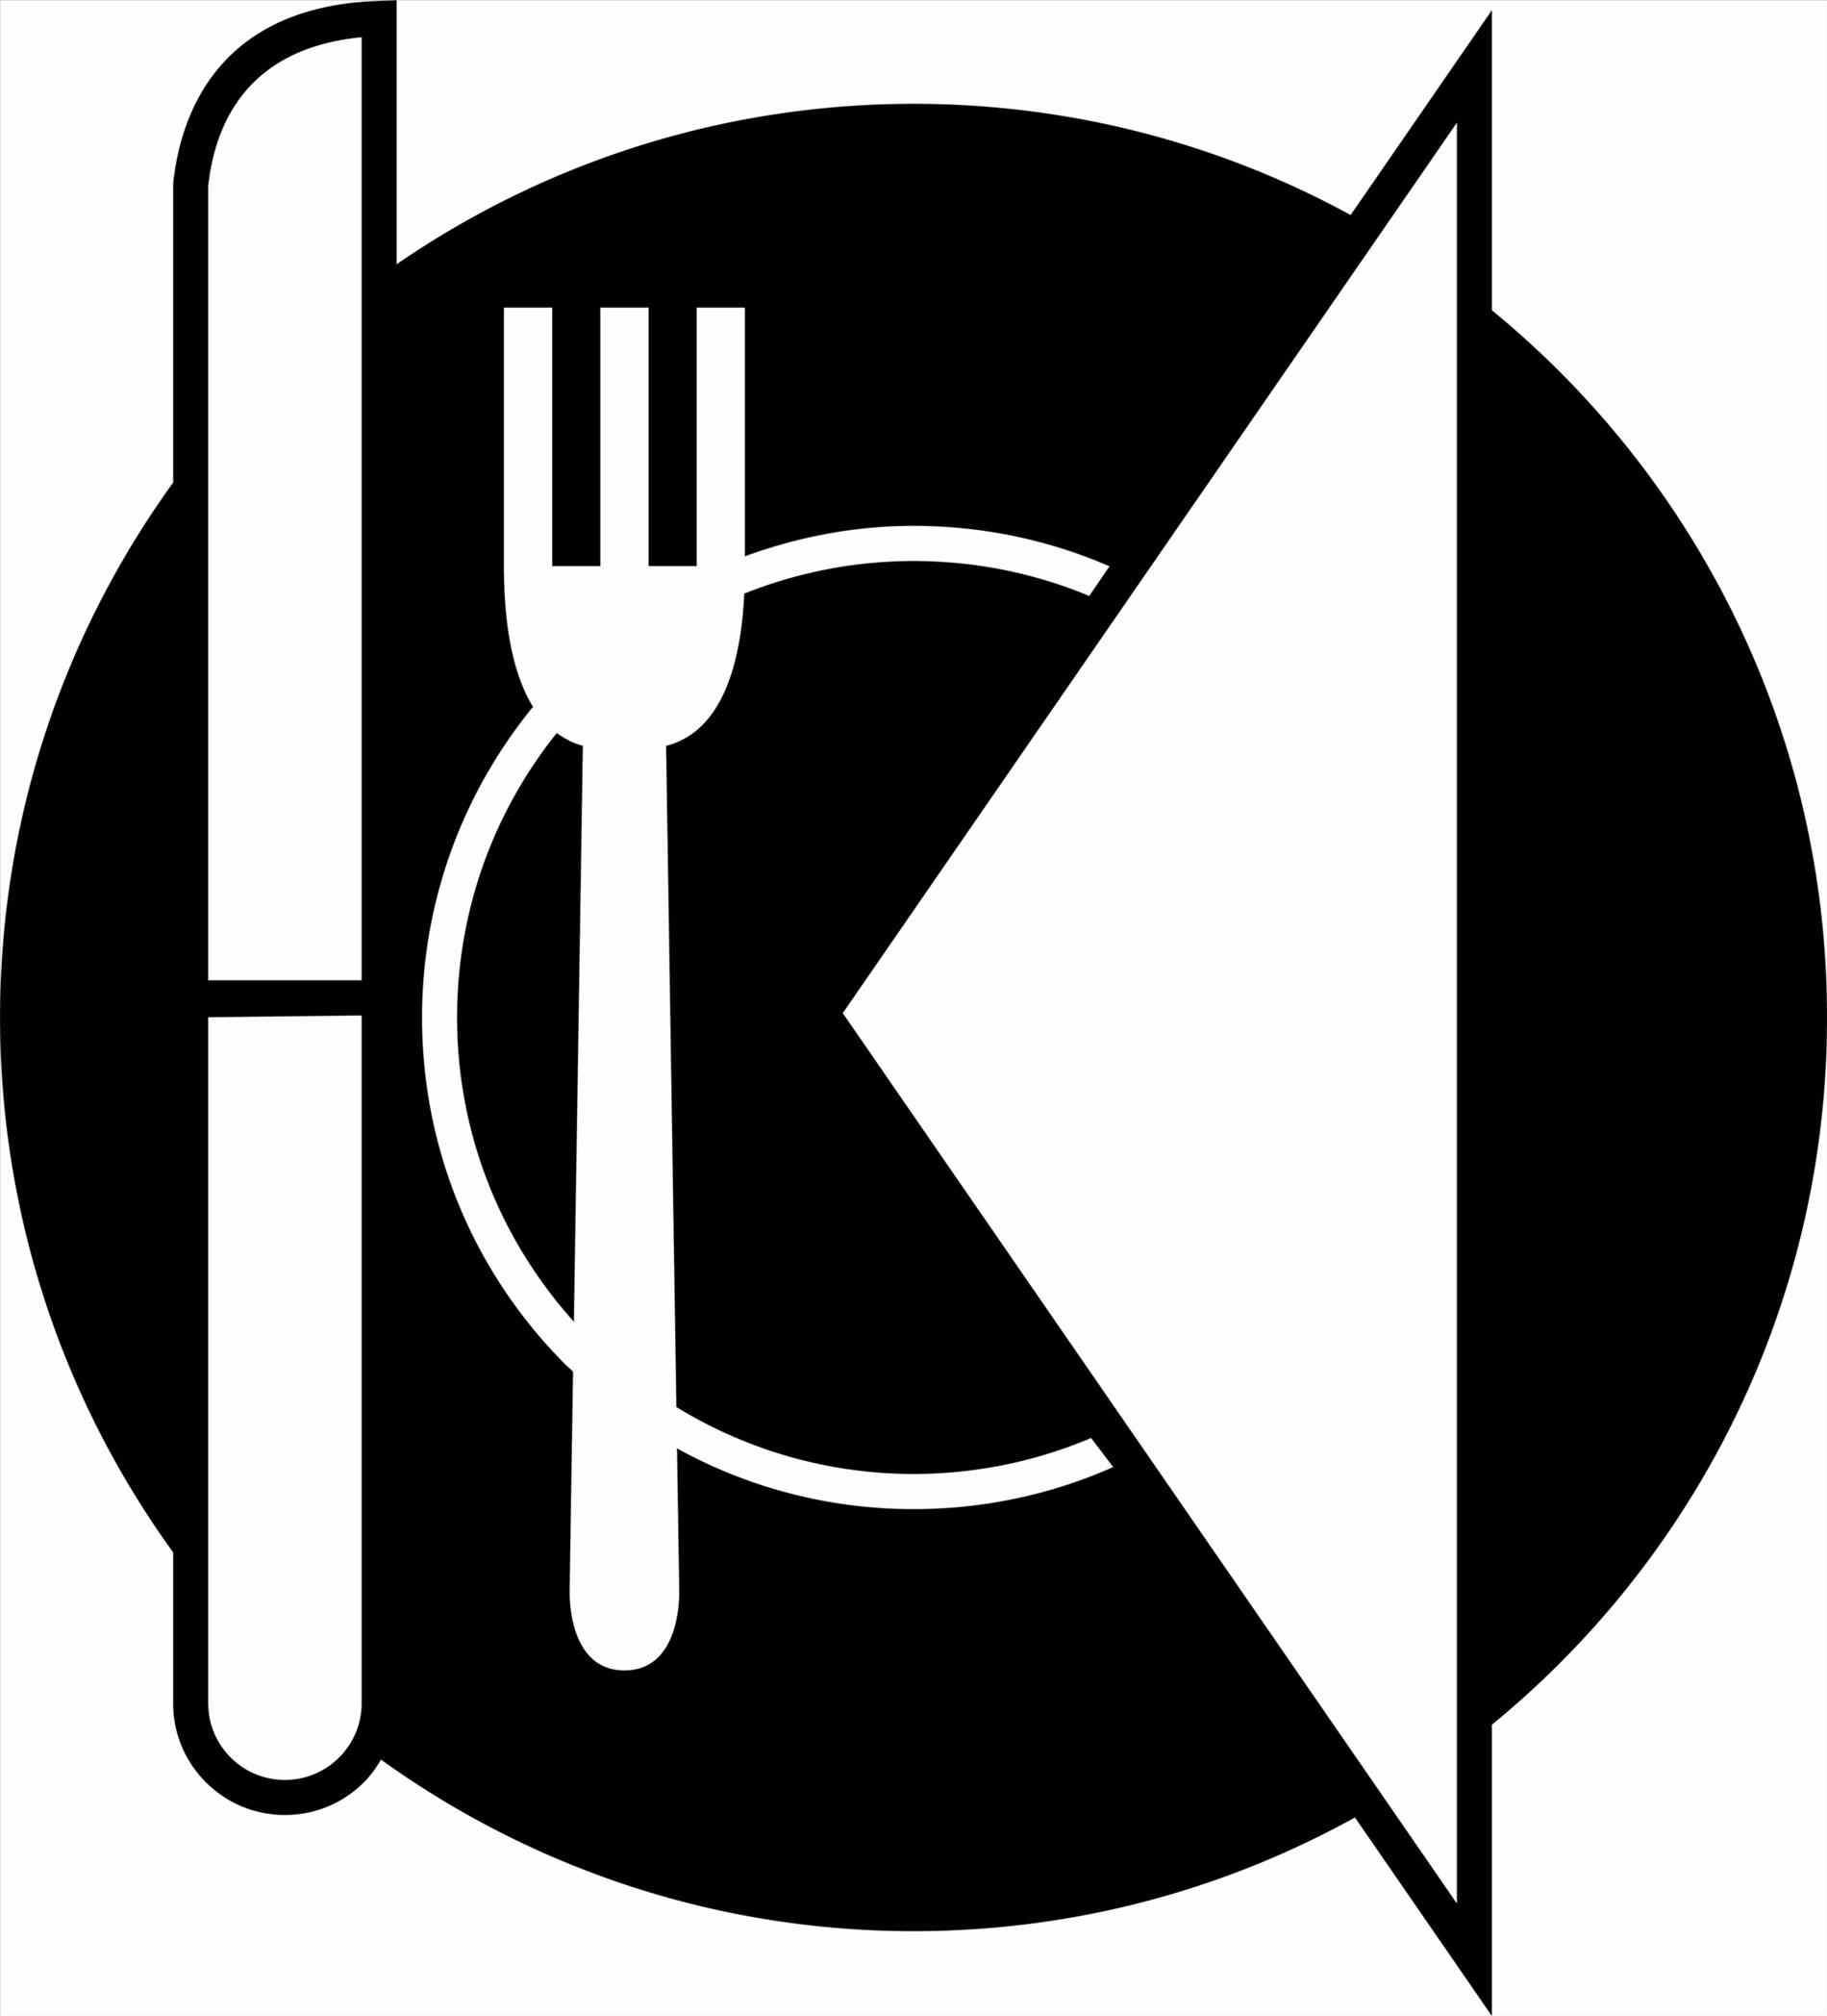 1900x2096 Family Dinner Clipart Black And White